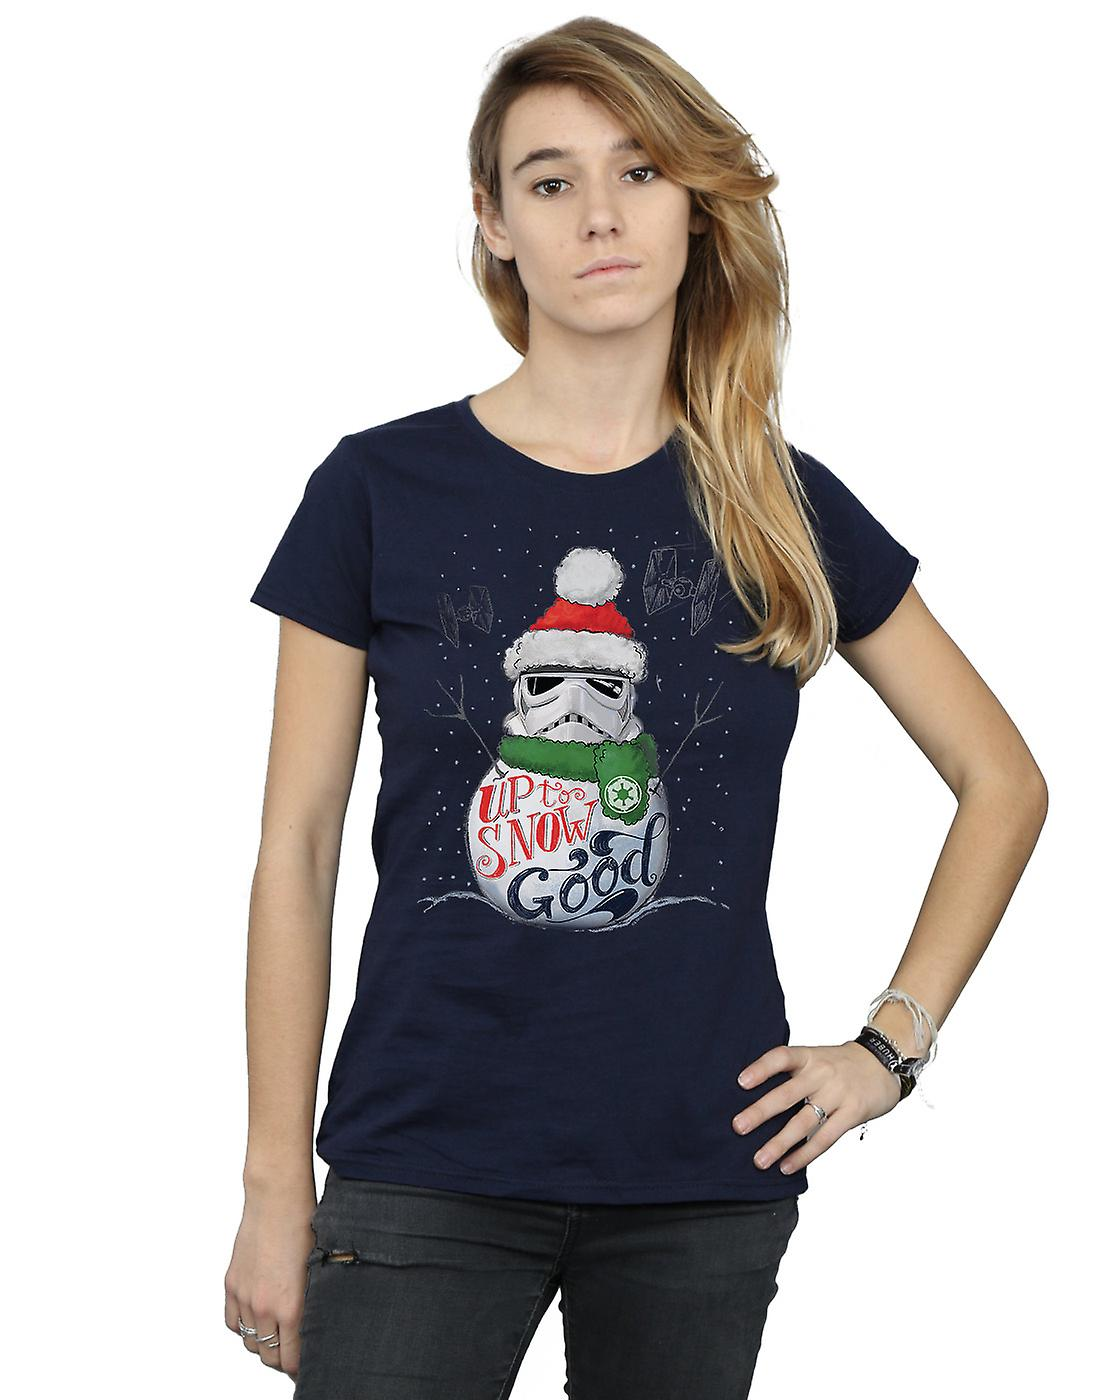 Star Wars Women's Stormtrooper Up To Snow Good T-Shirt